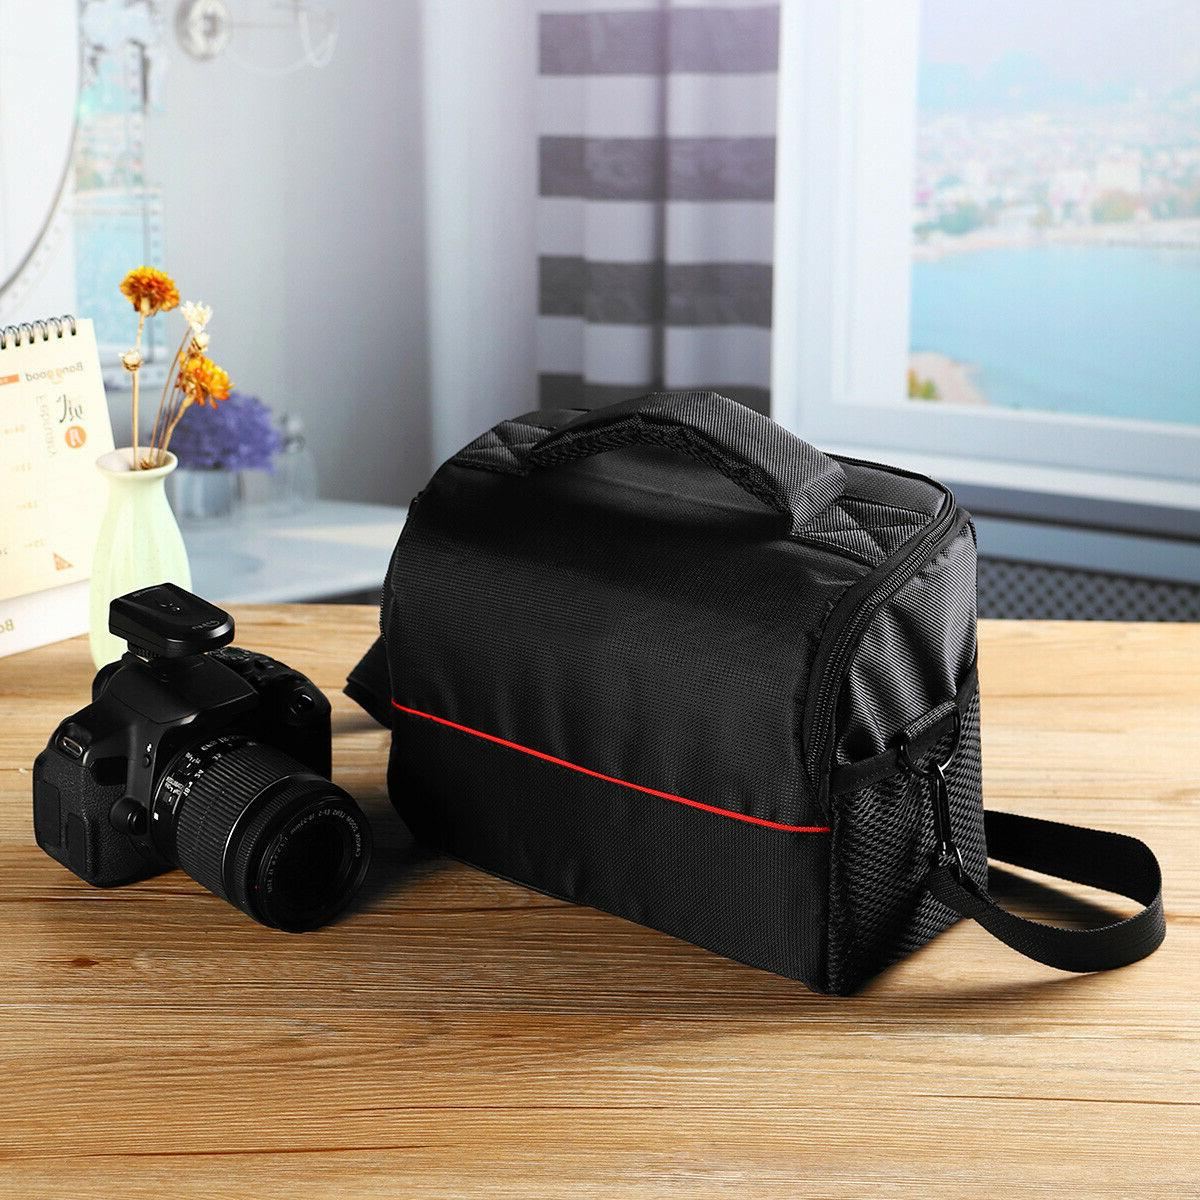 Digital Waterproof Case Canon Nikon